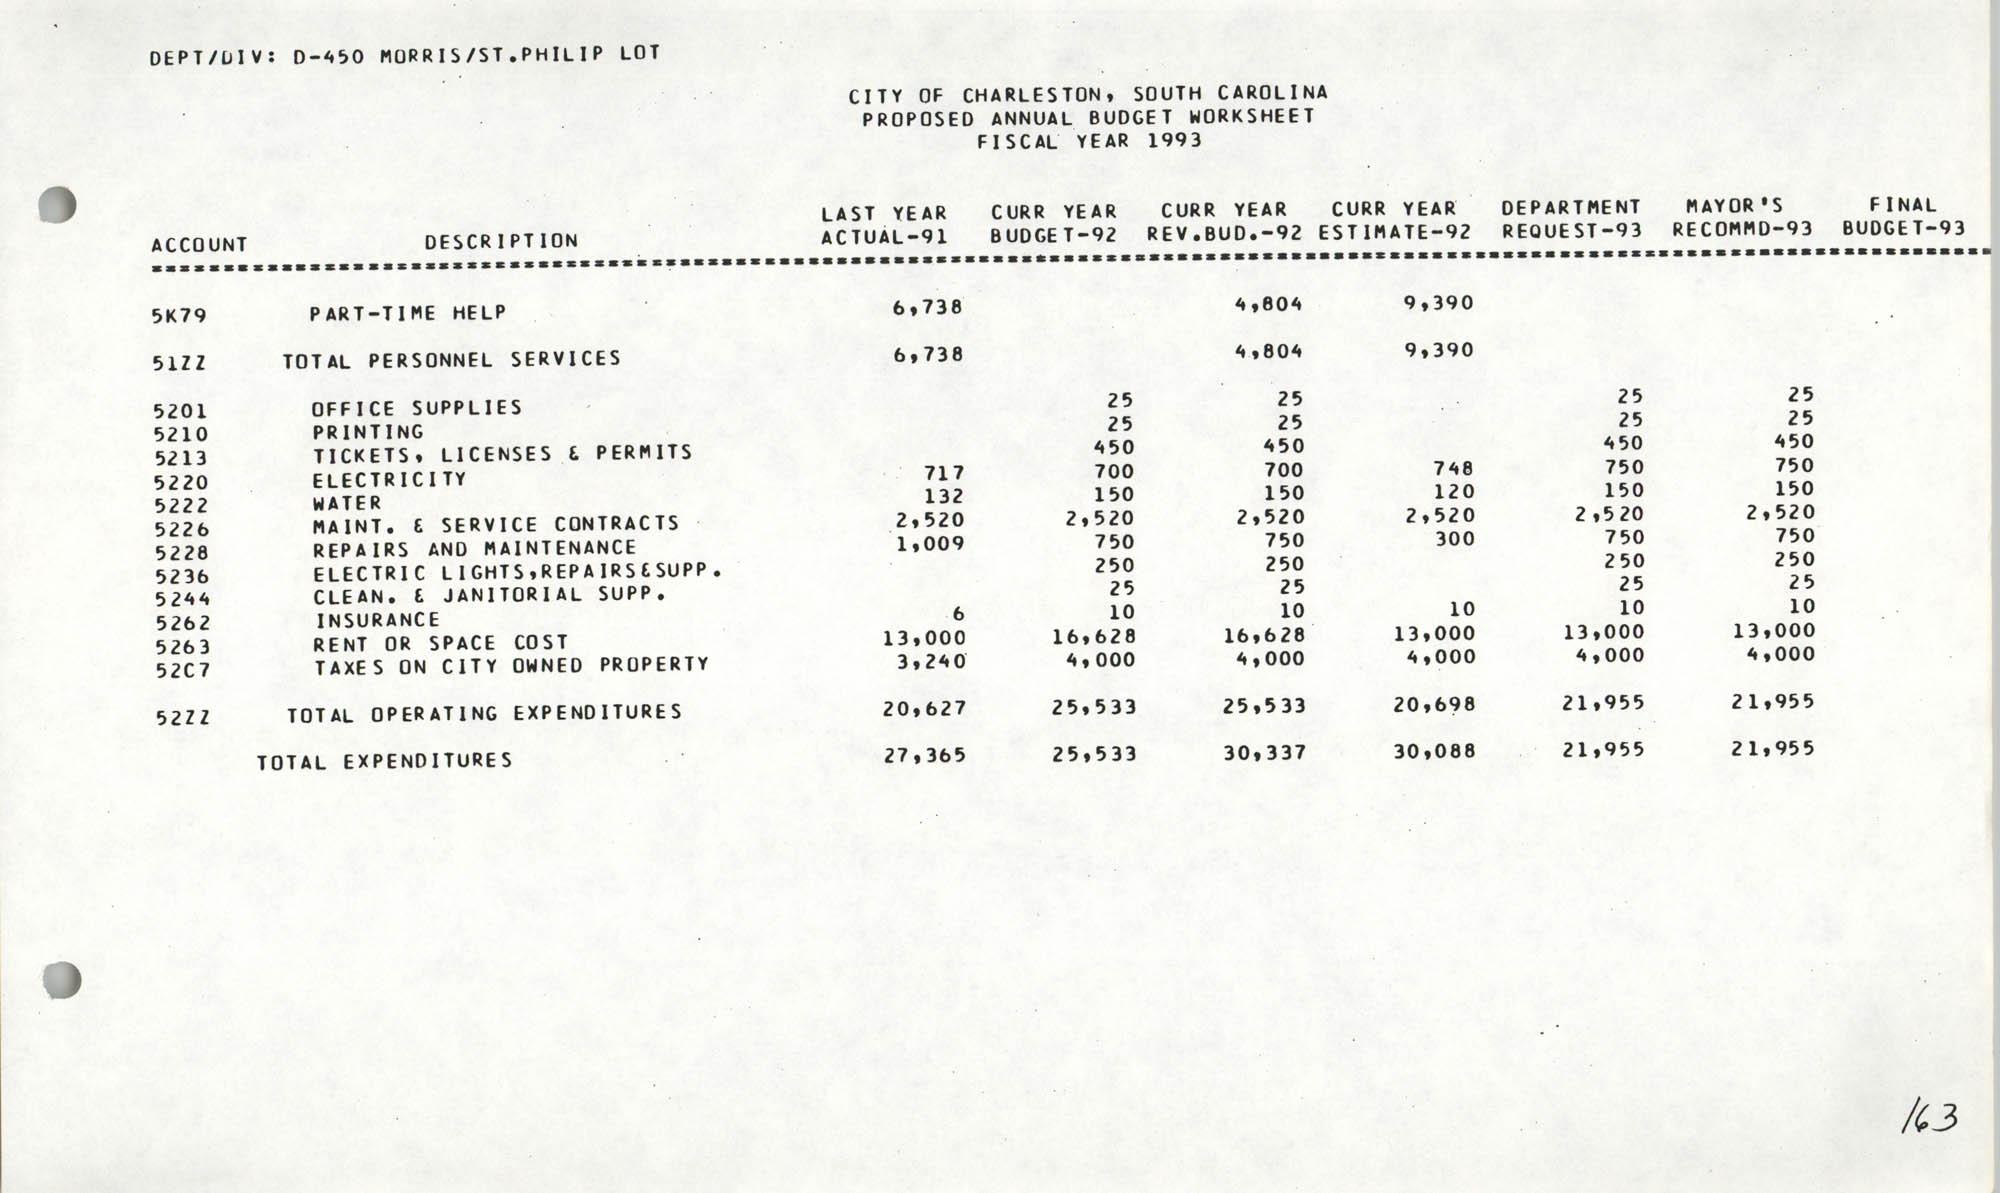 The City Council of Charleston, South Carolina, 1993 Budget, Page 163